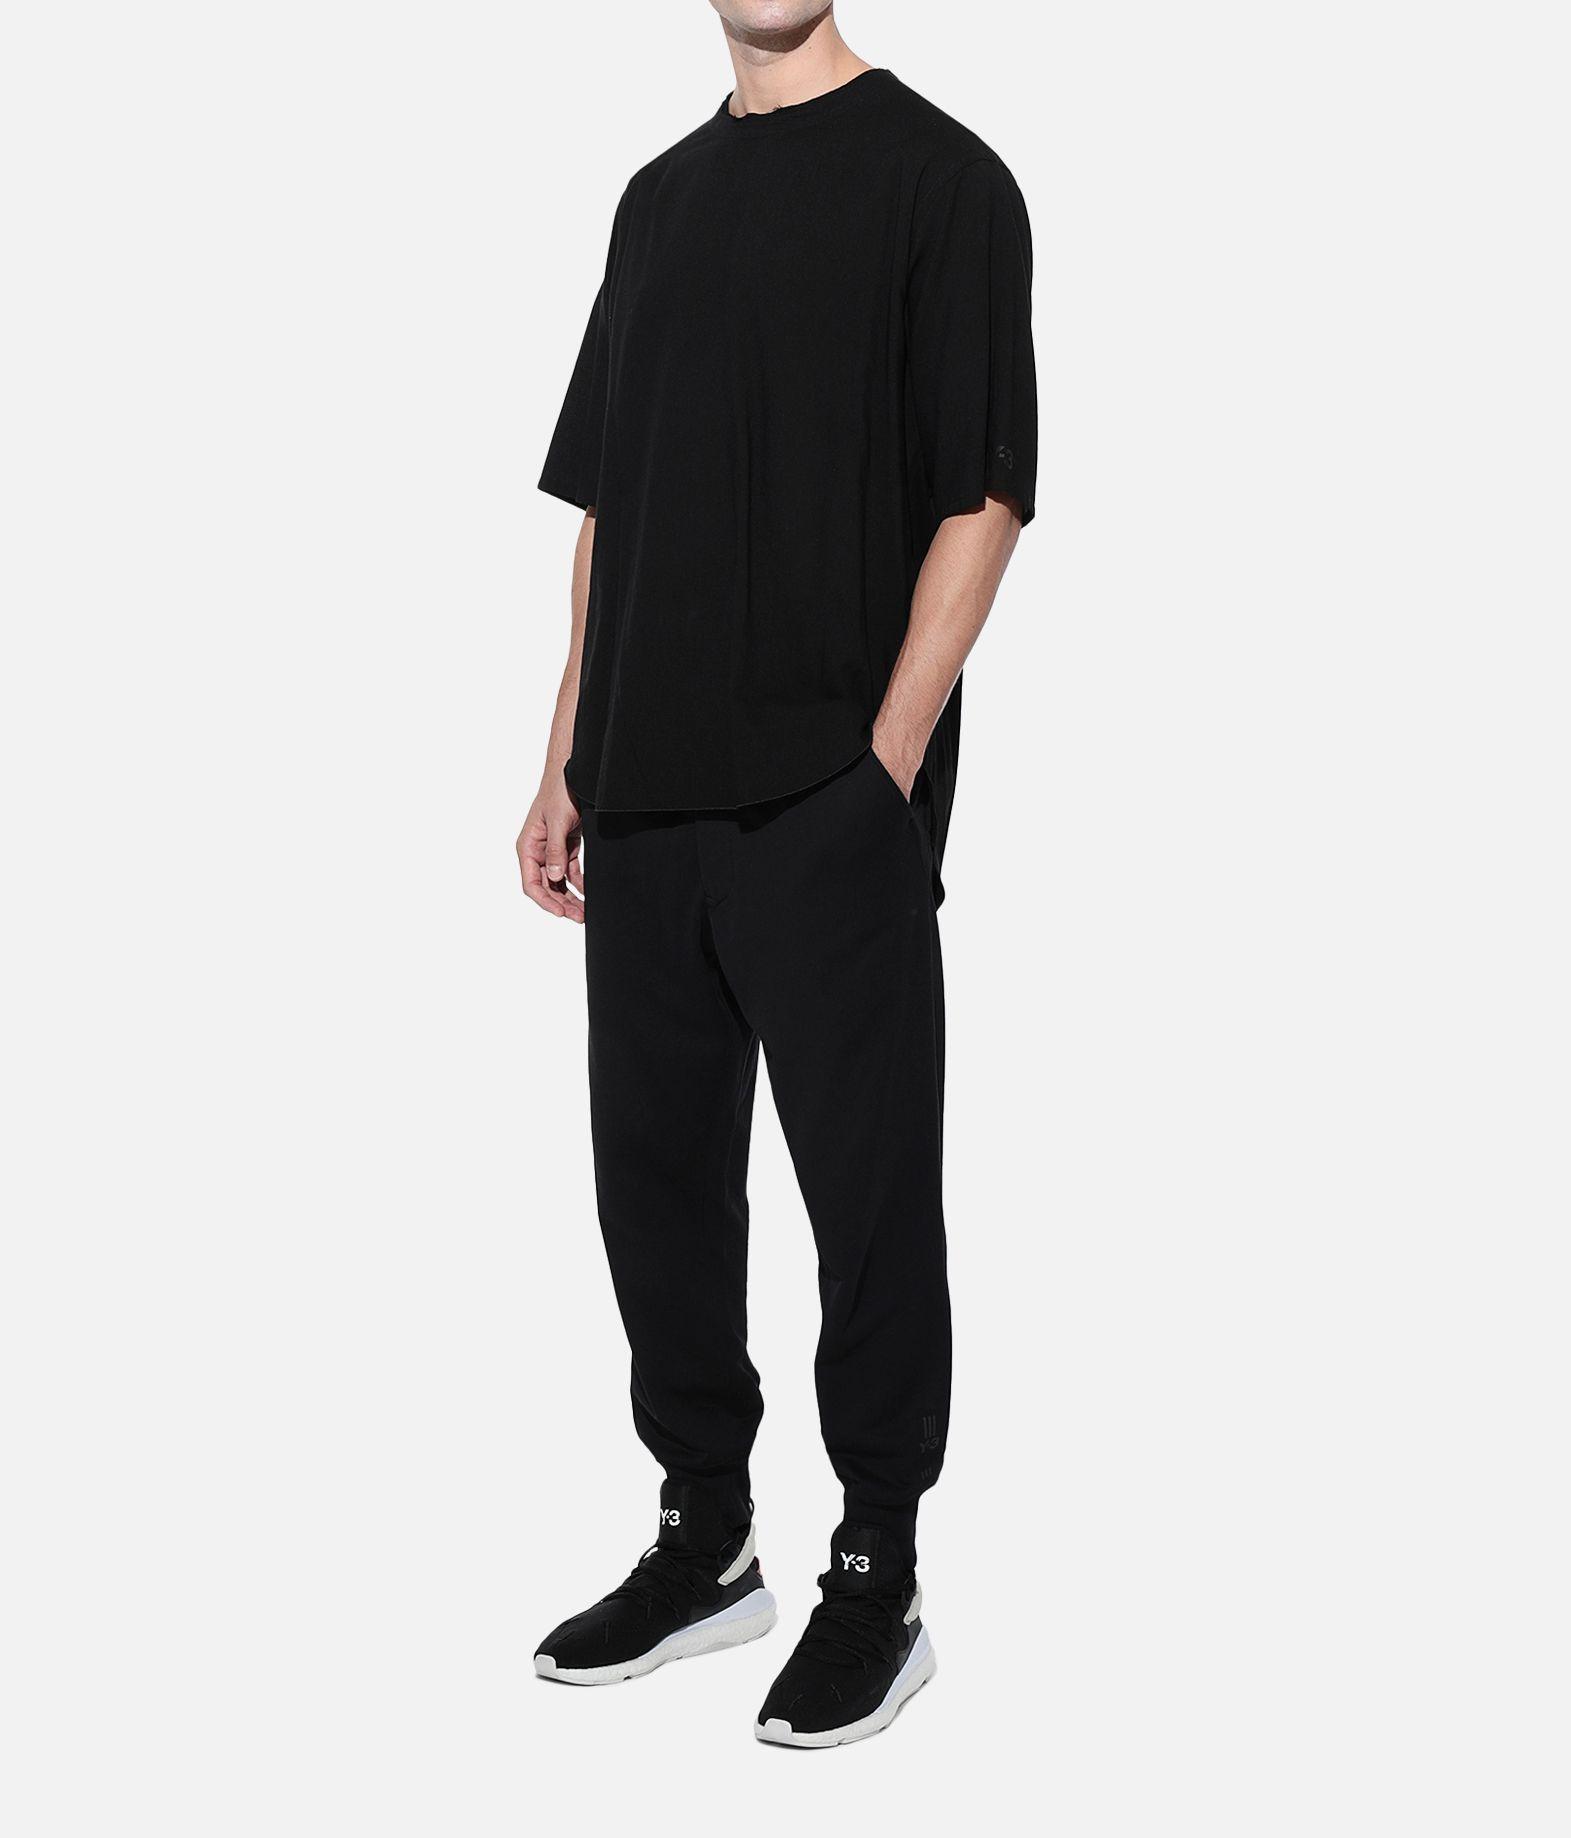 Y-3 Y-3 Long Tee  T-shirt maniche corte Uomo a